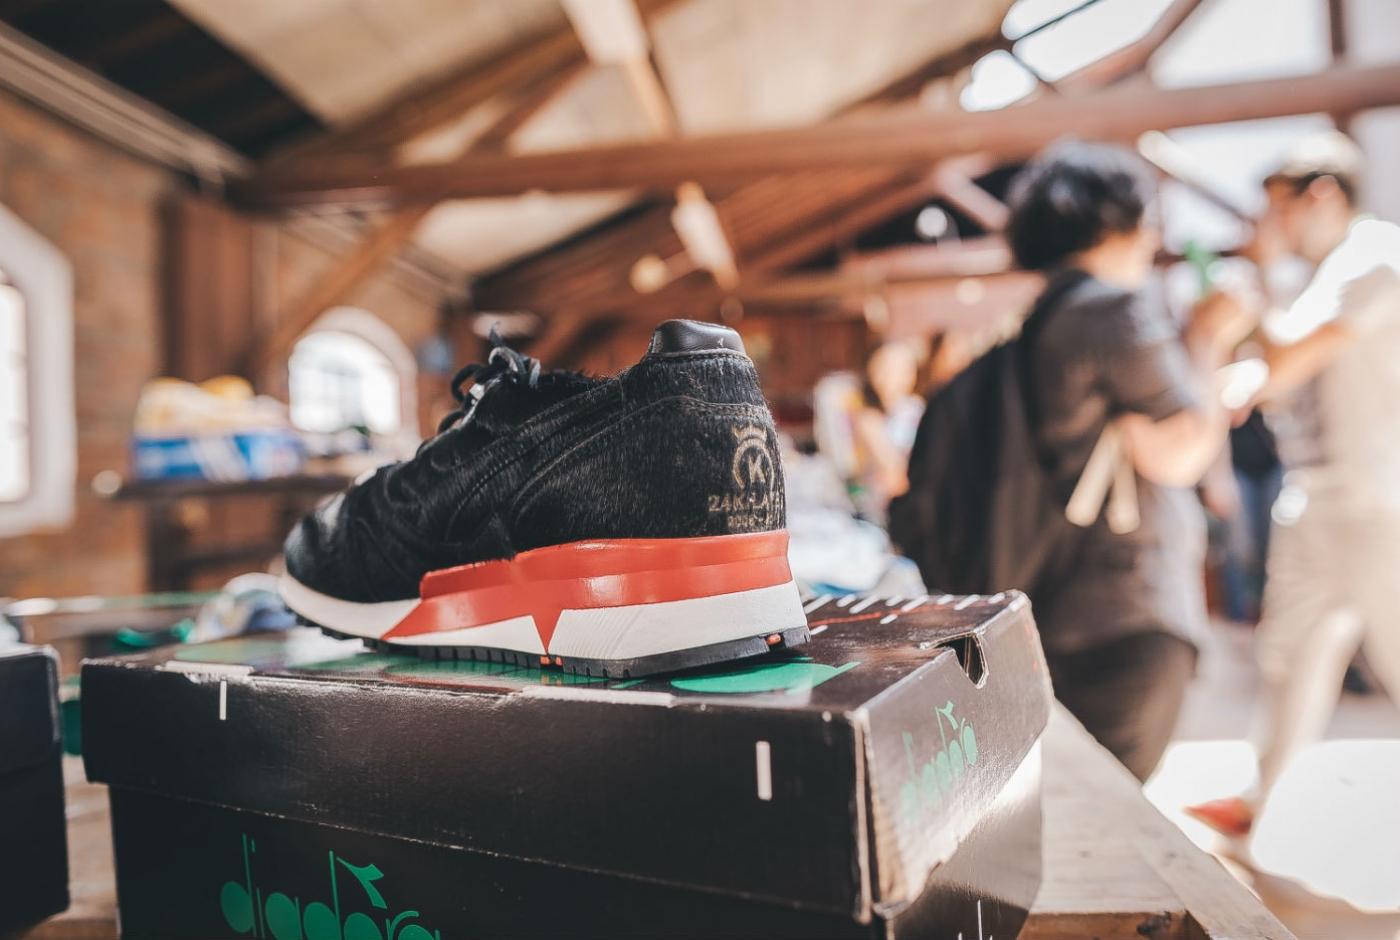 sneakers-love-portugal-2016-005